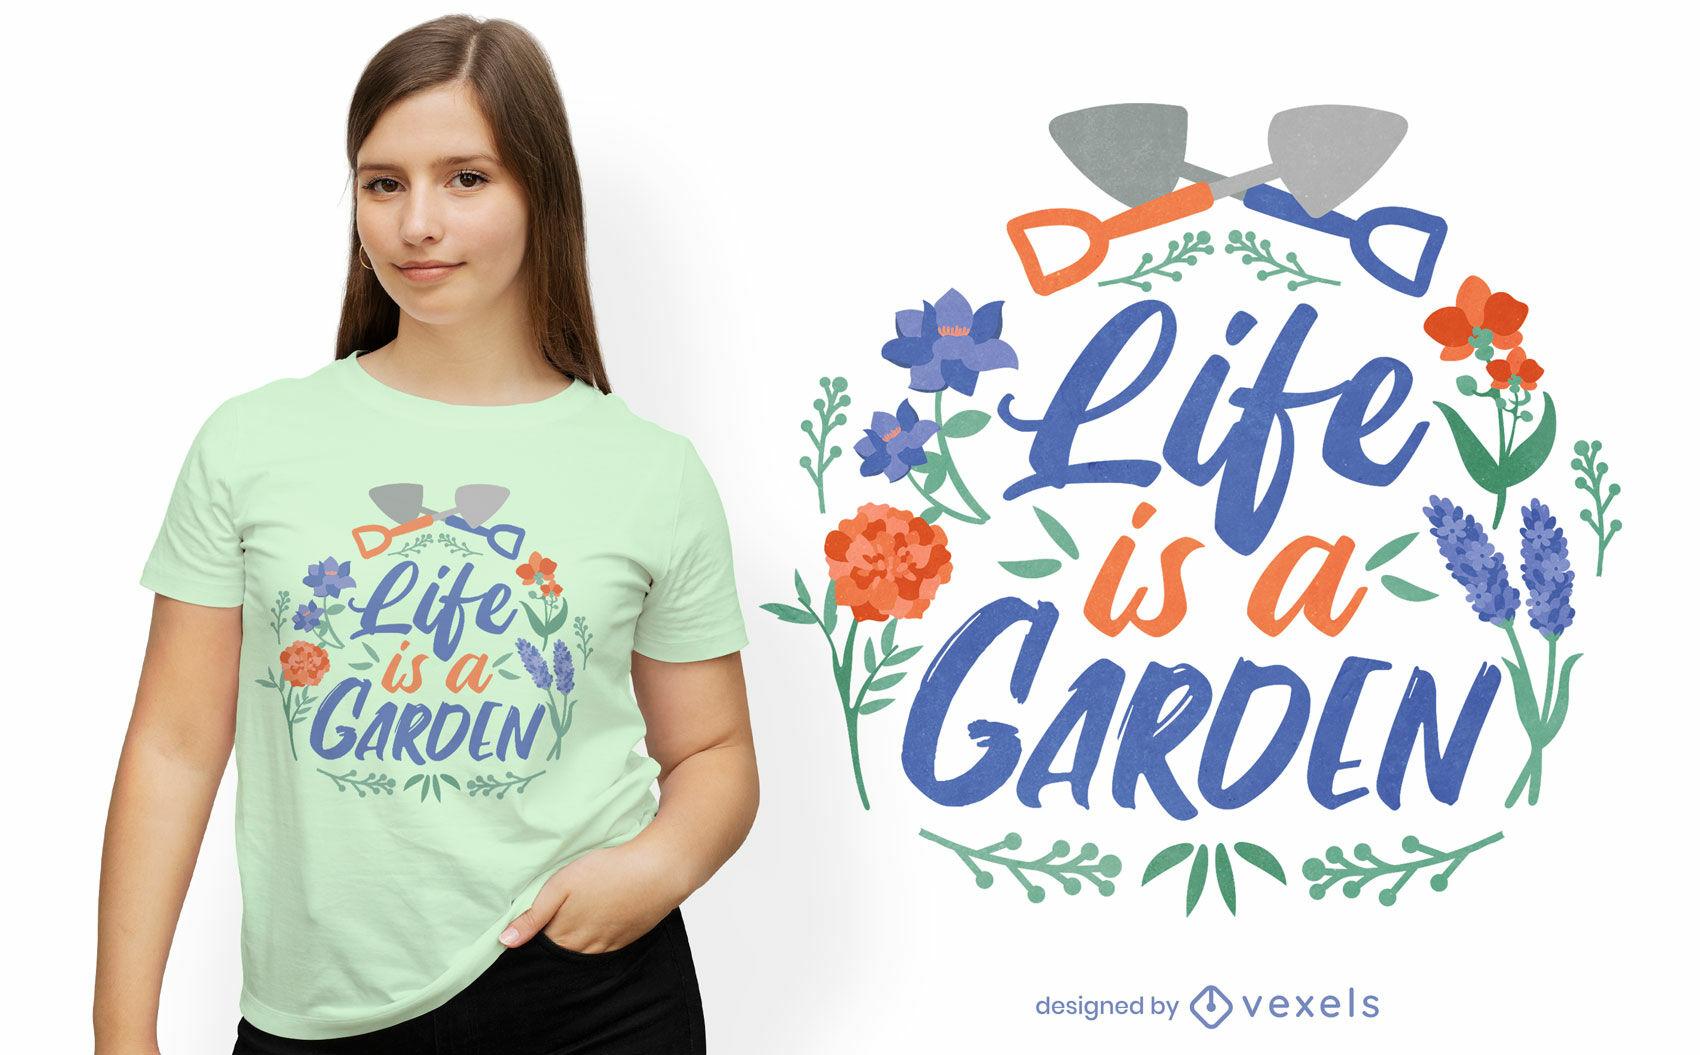 Life is a garden t-shirt design lettering